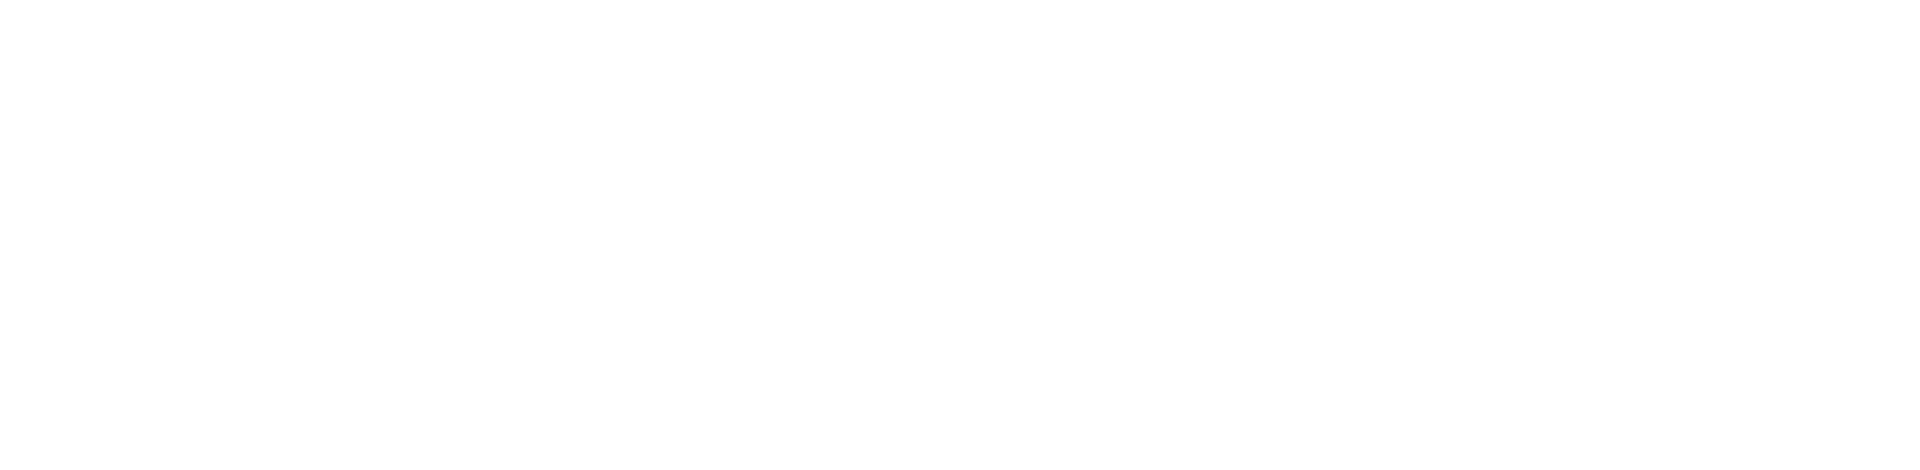 Australia white overlay clipart png transparent Home » Shire of Mukinbudin png transparent